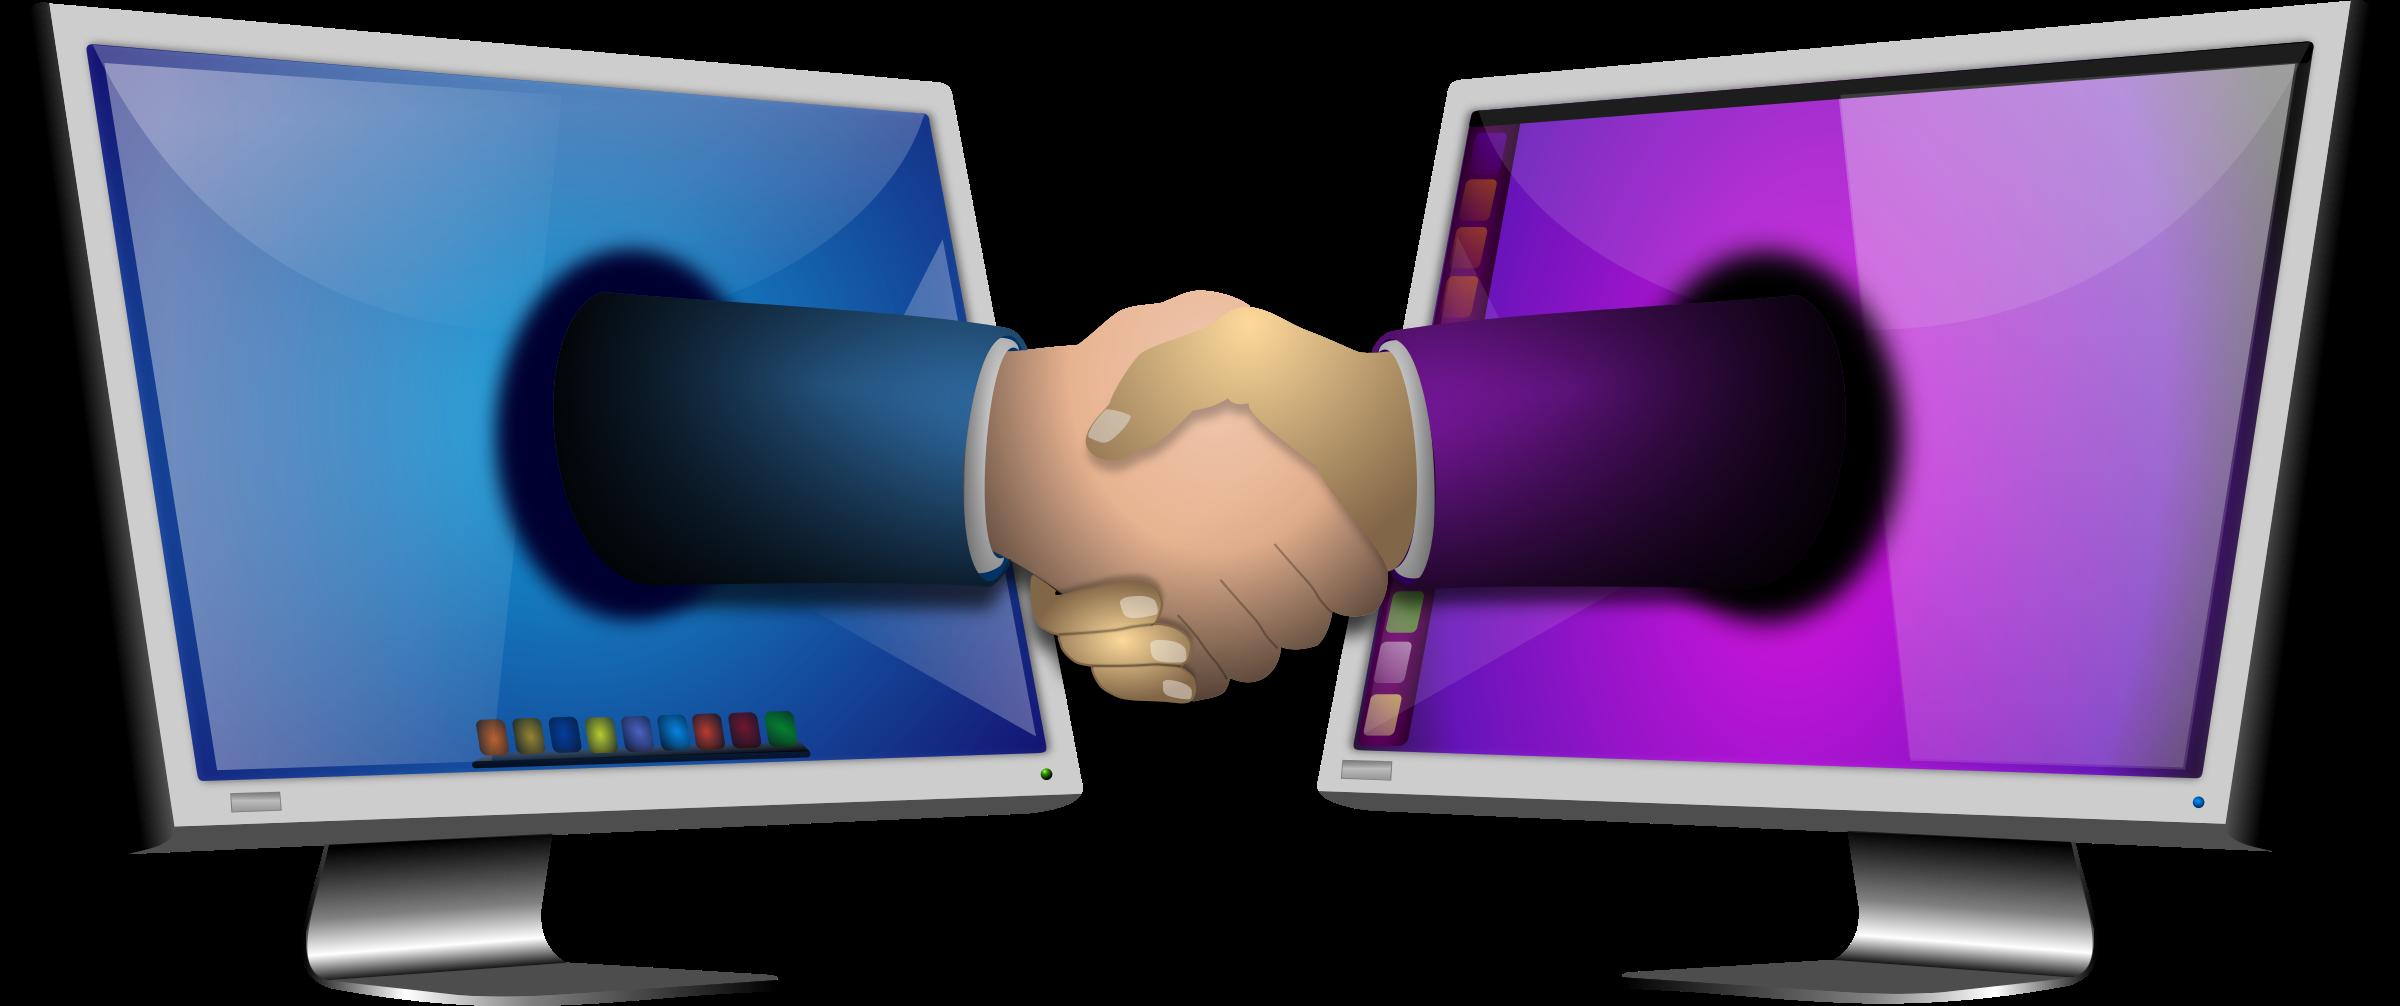 Computer big image png. Handshake clipart support